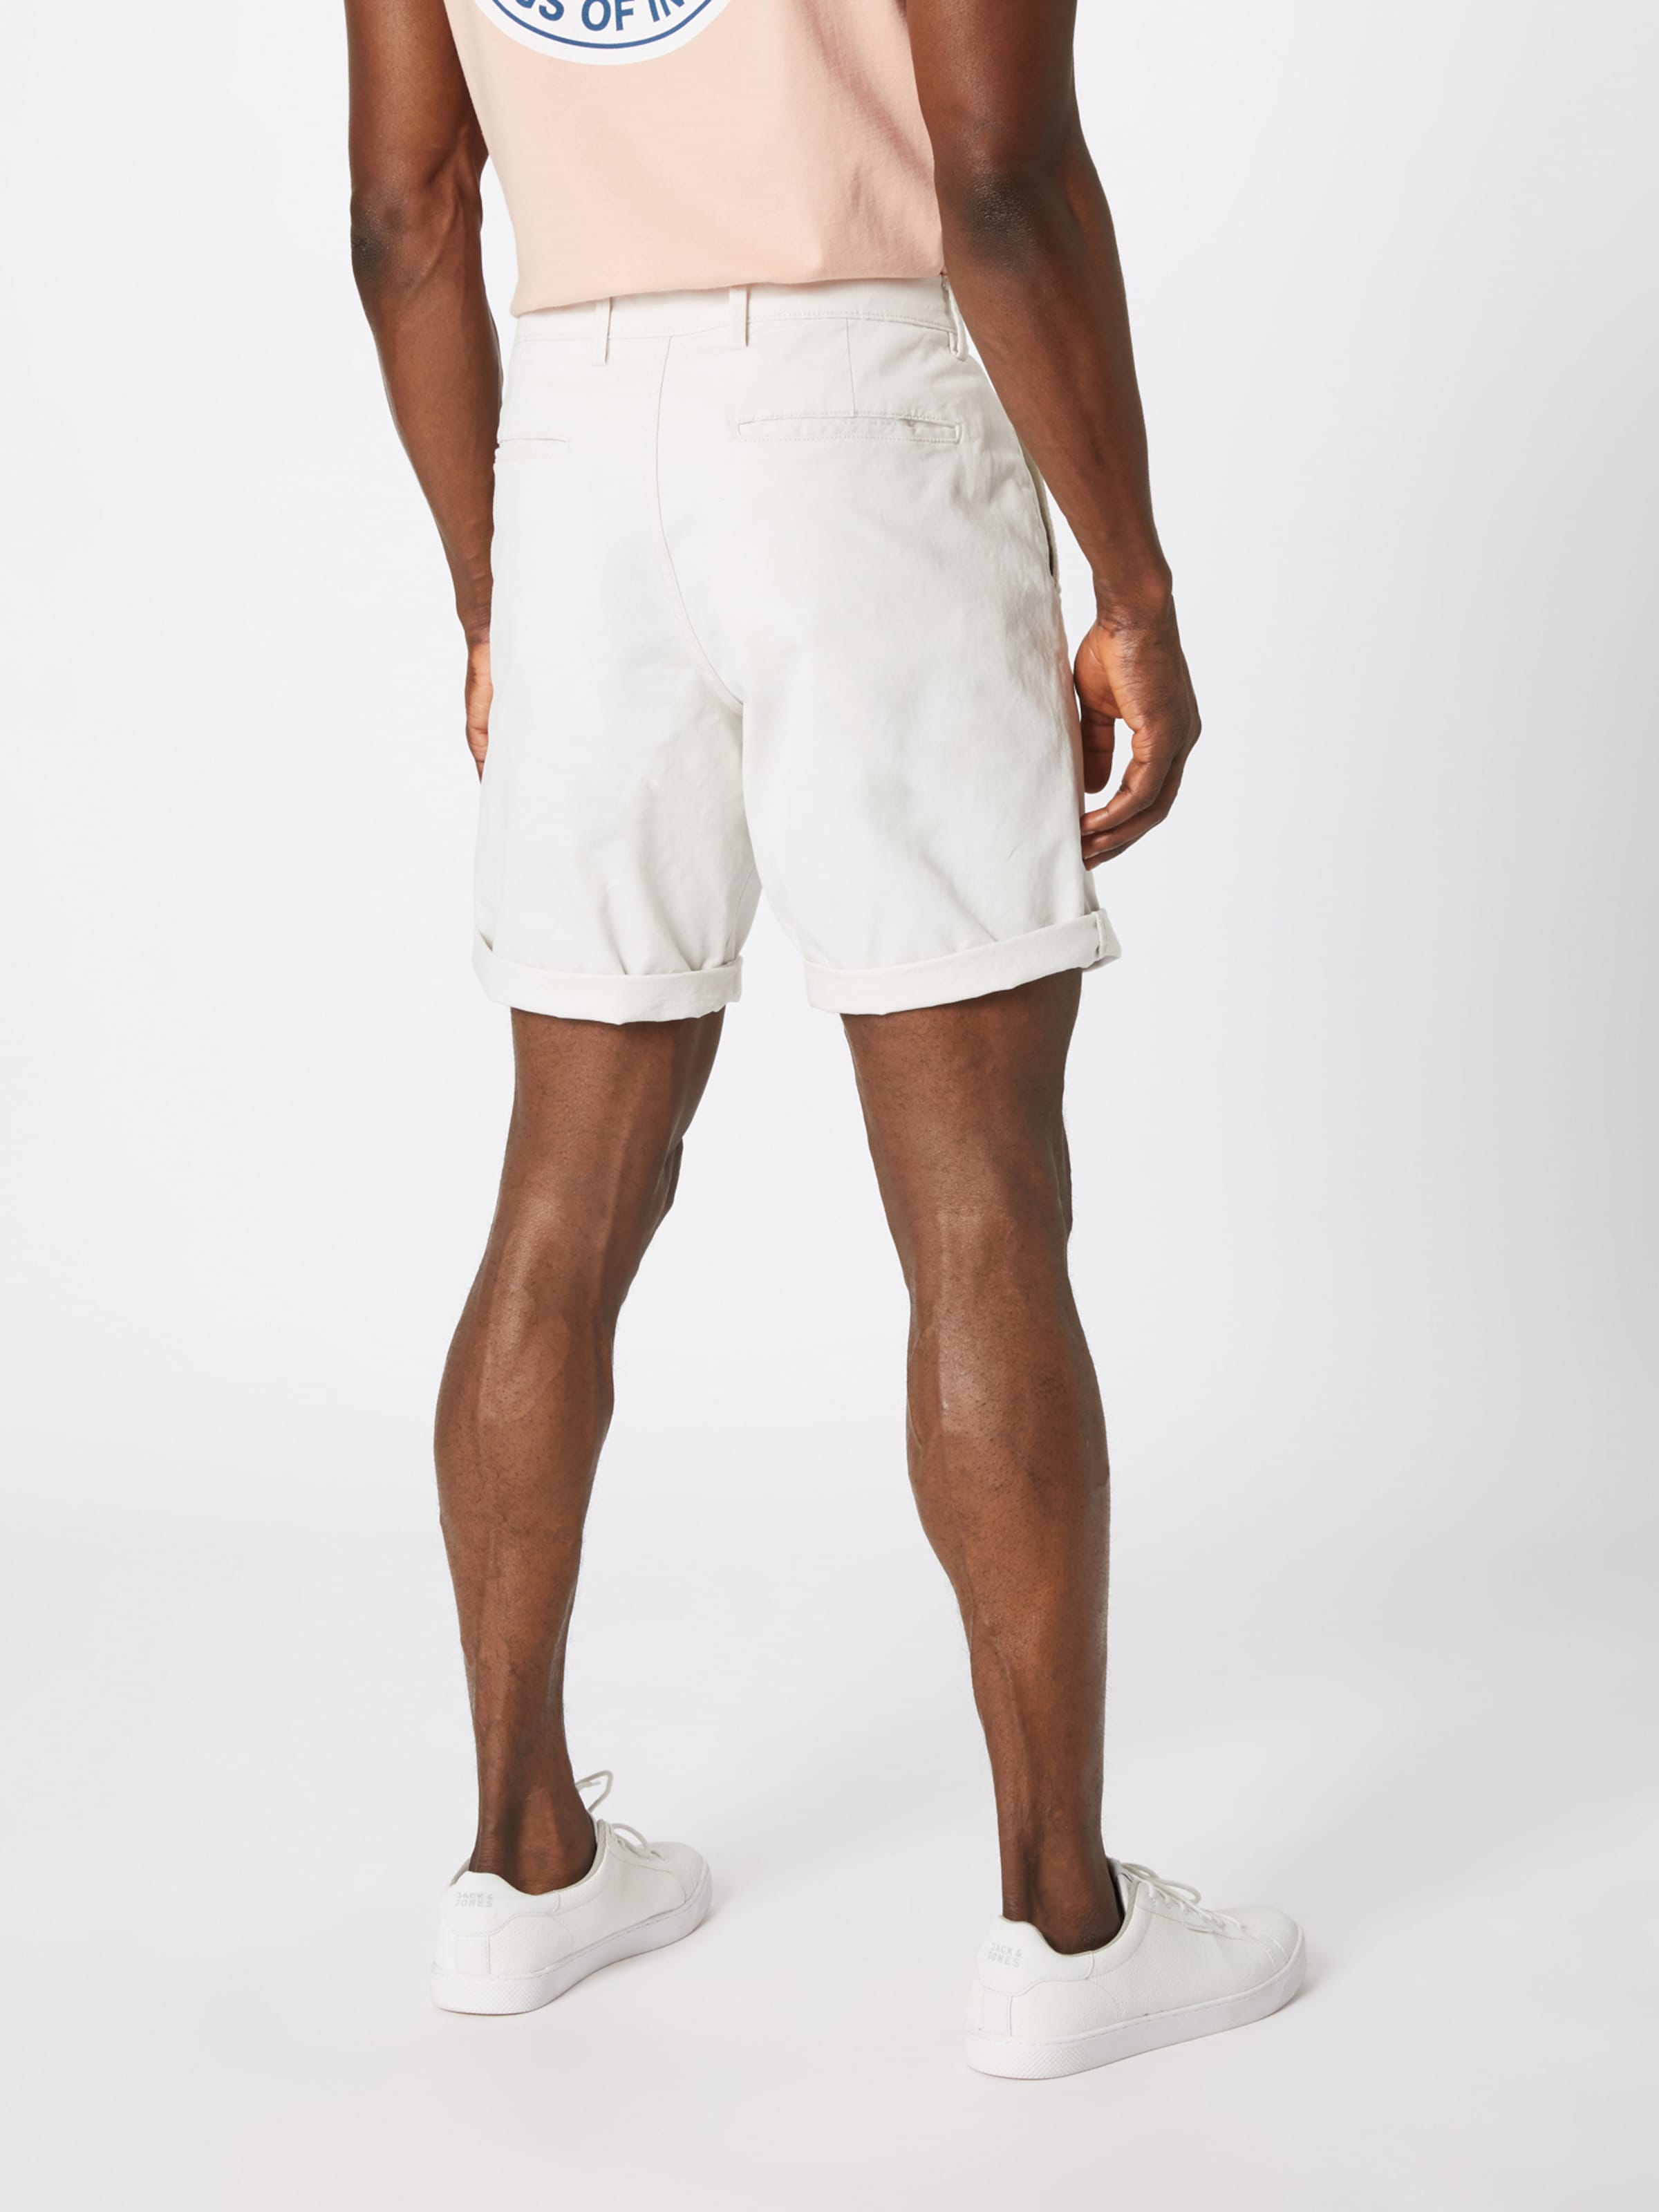 Weiß Gap Weiß Shorts Gap In In In Gap Shorts Shorts Gap Weiß Shorts BoWdCerx